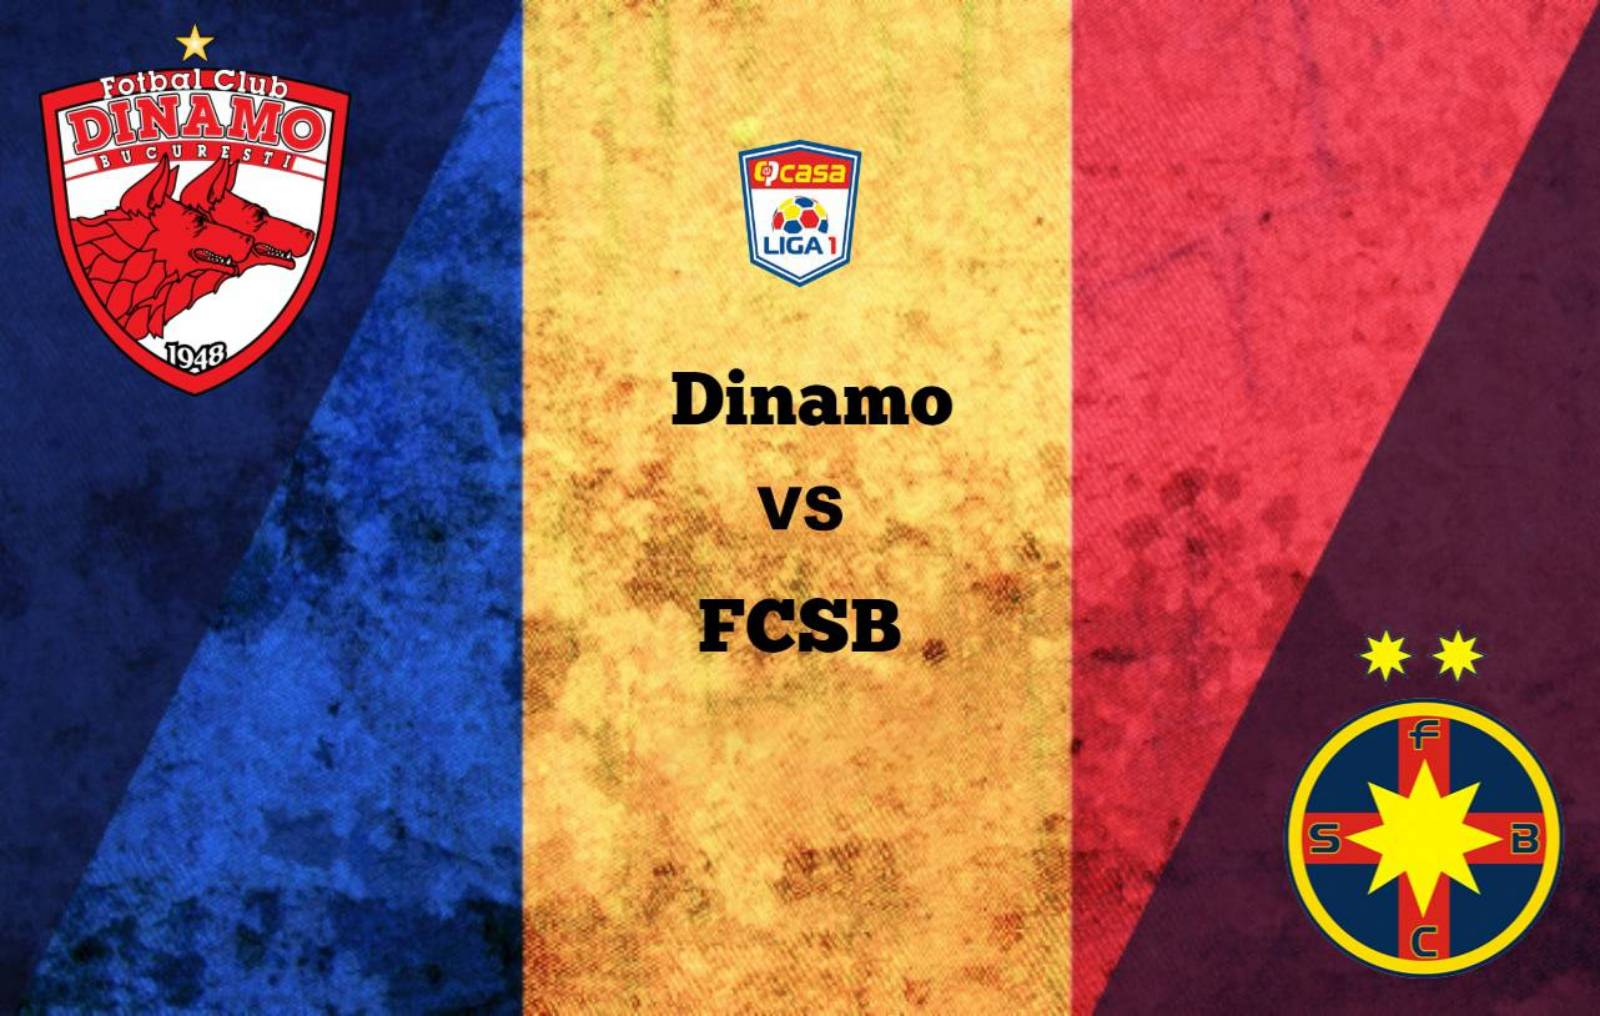 DINAMO - FCSB LIVE Orange